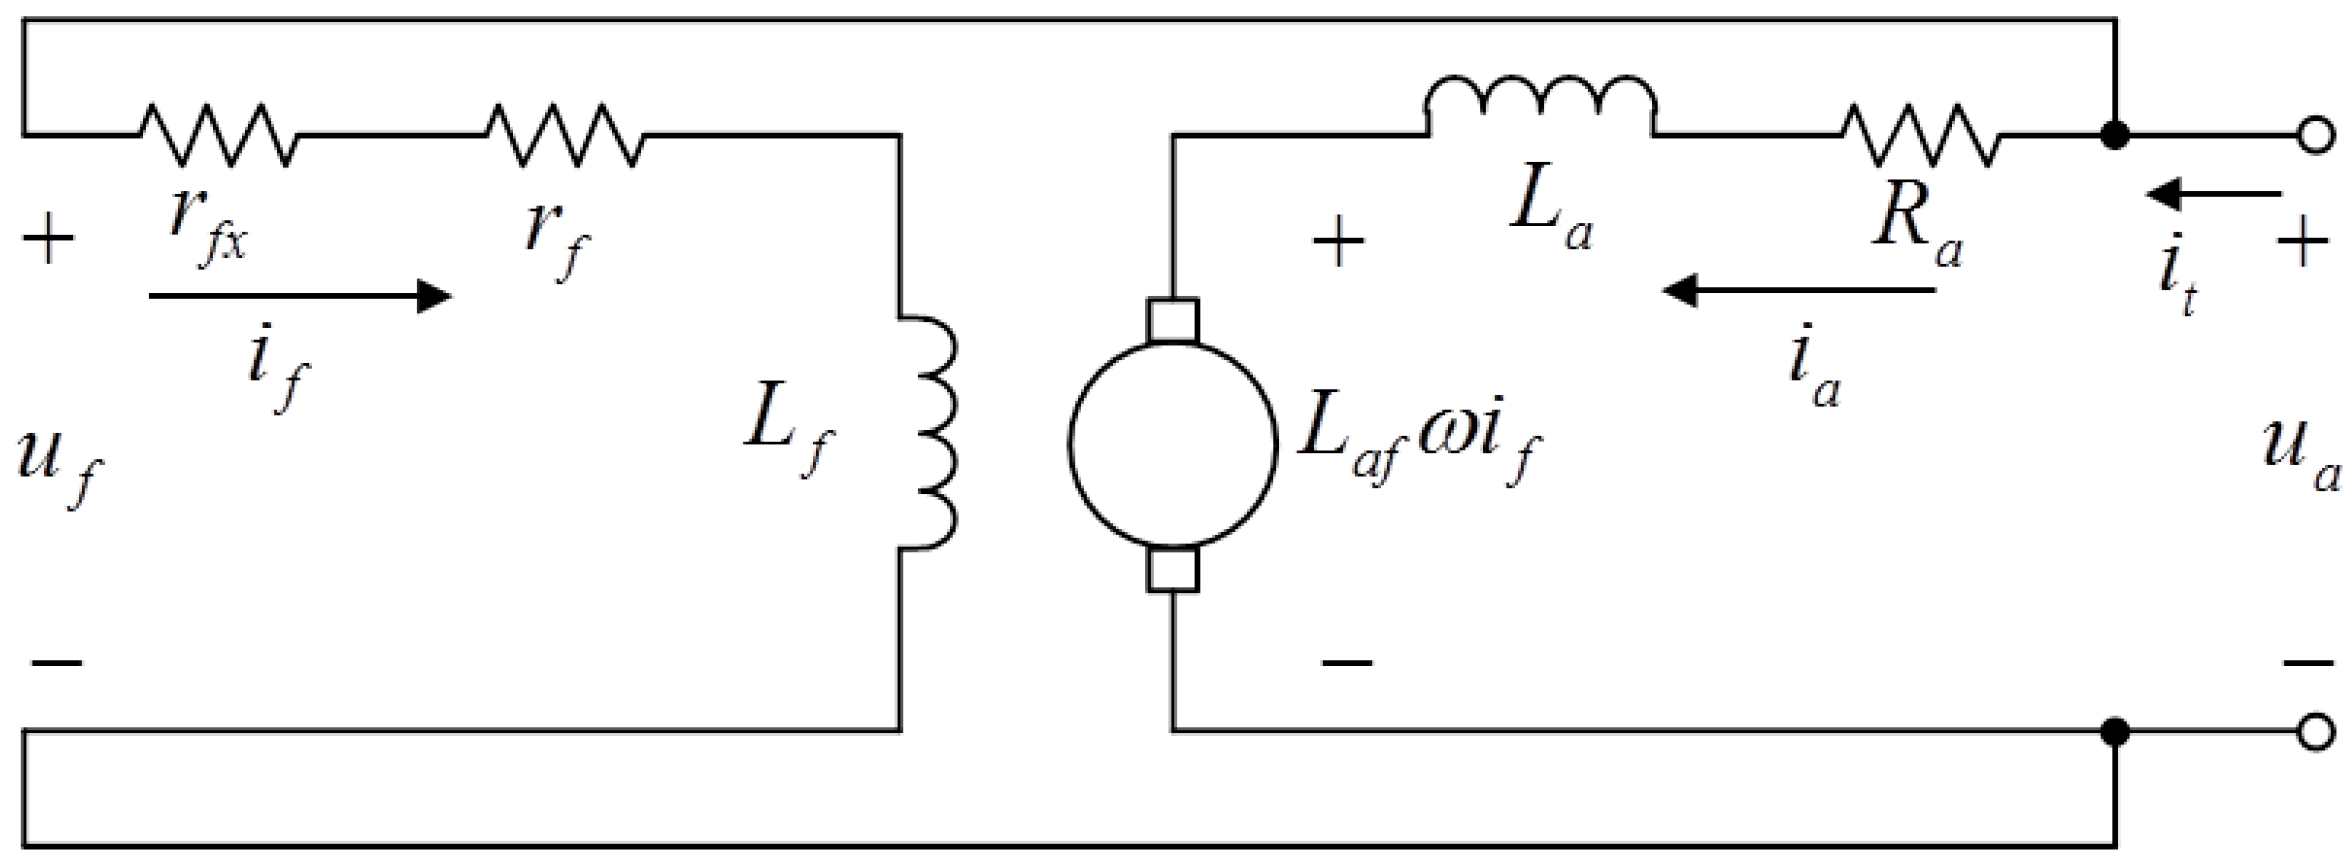 shunt motor wiring diagram trailer 6 way plug brushed dc servo control electronics